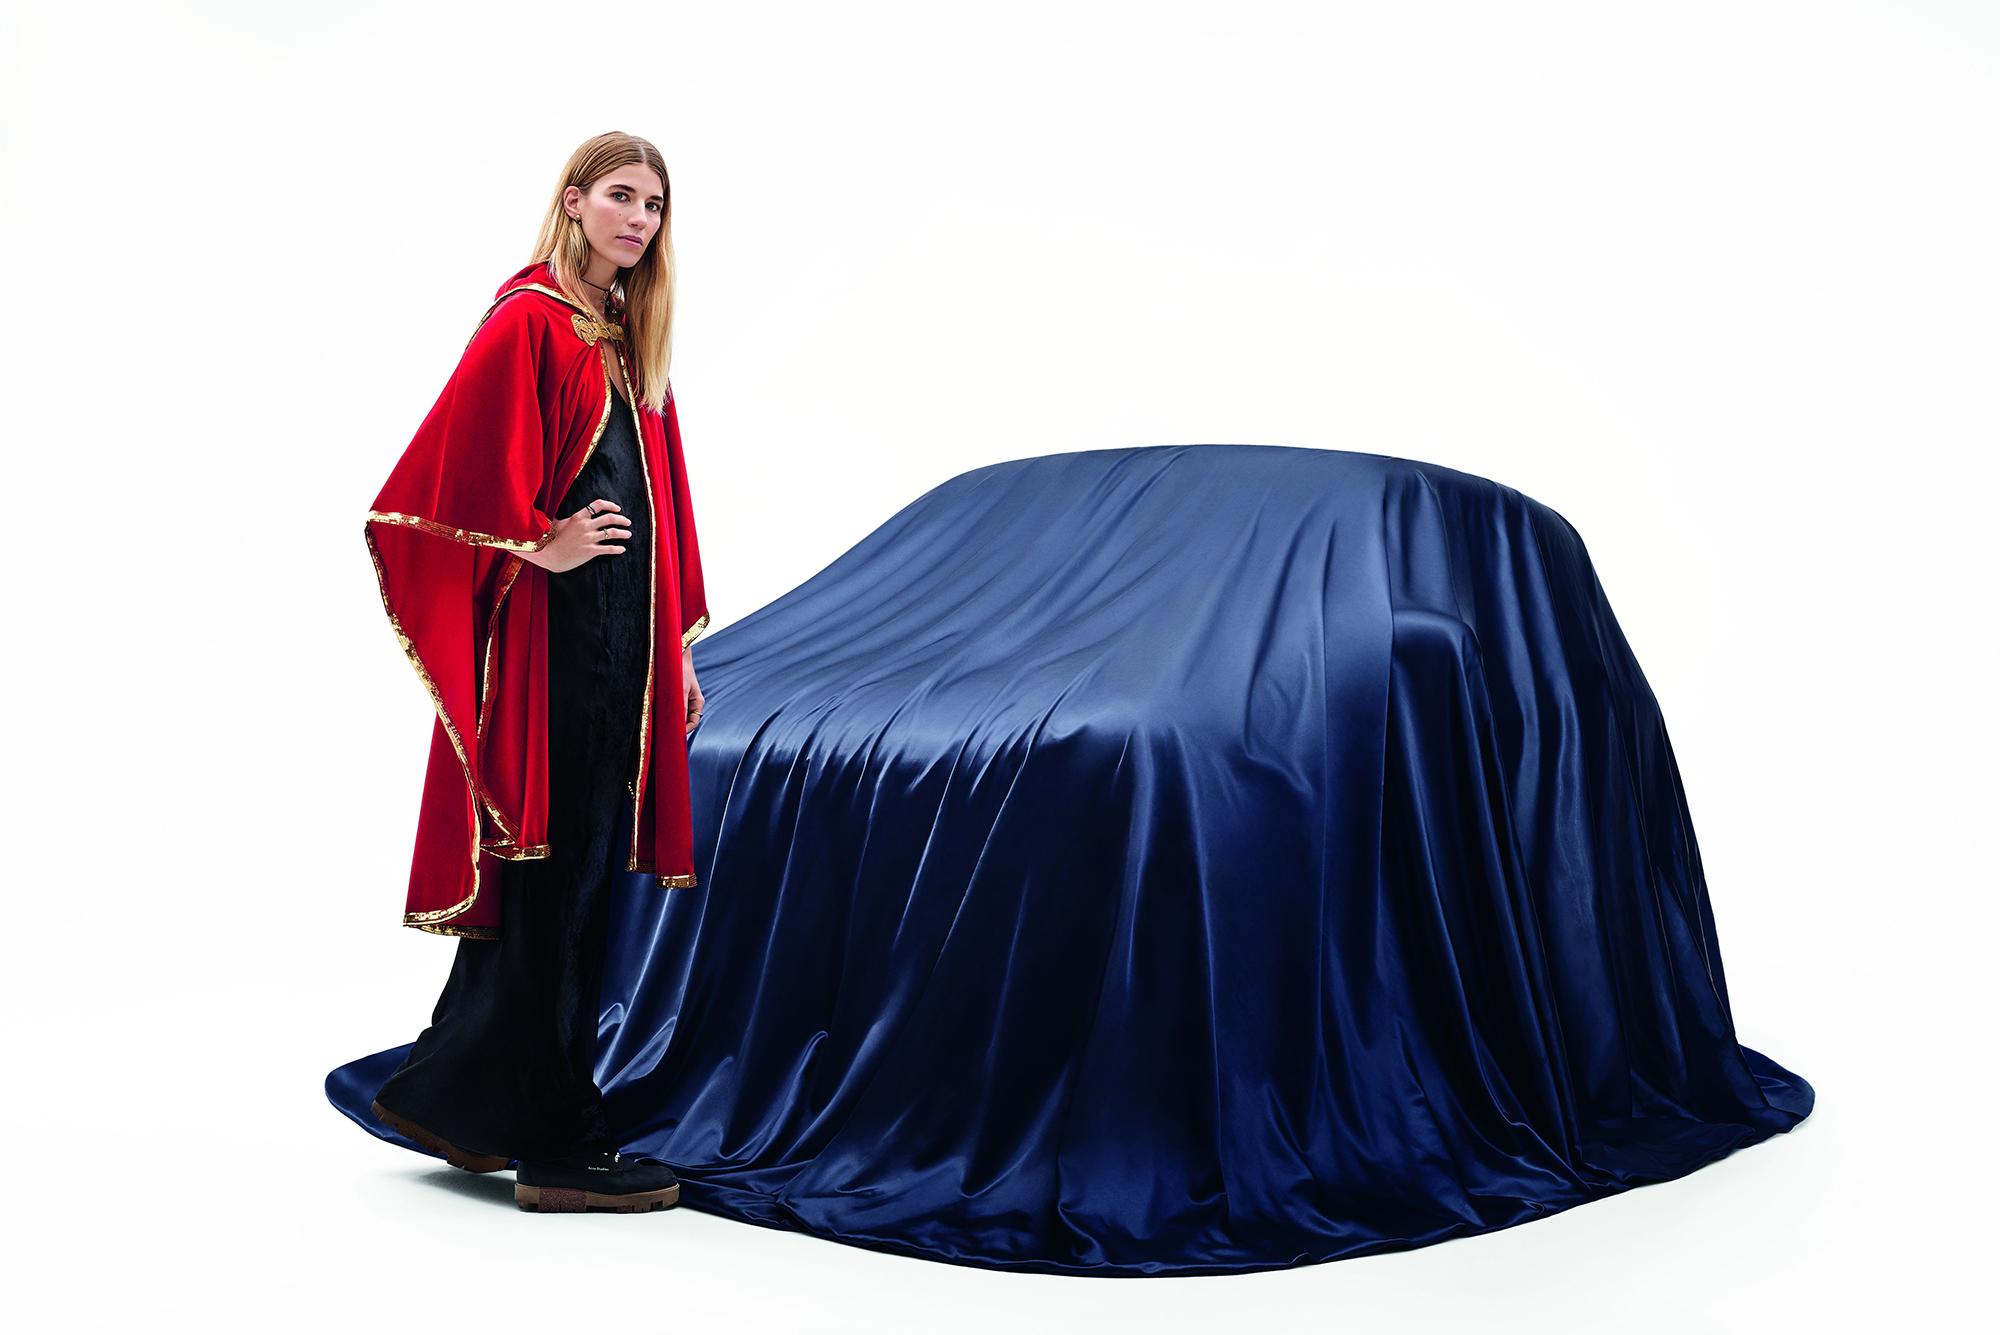 A Fashionable Car Revealed at Berlin Fashion Week